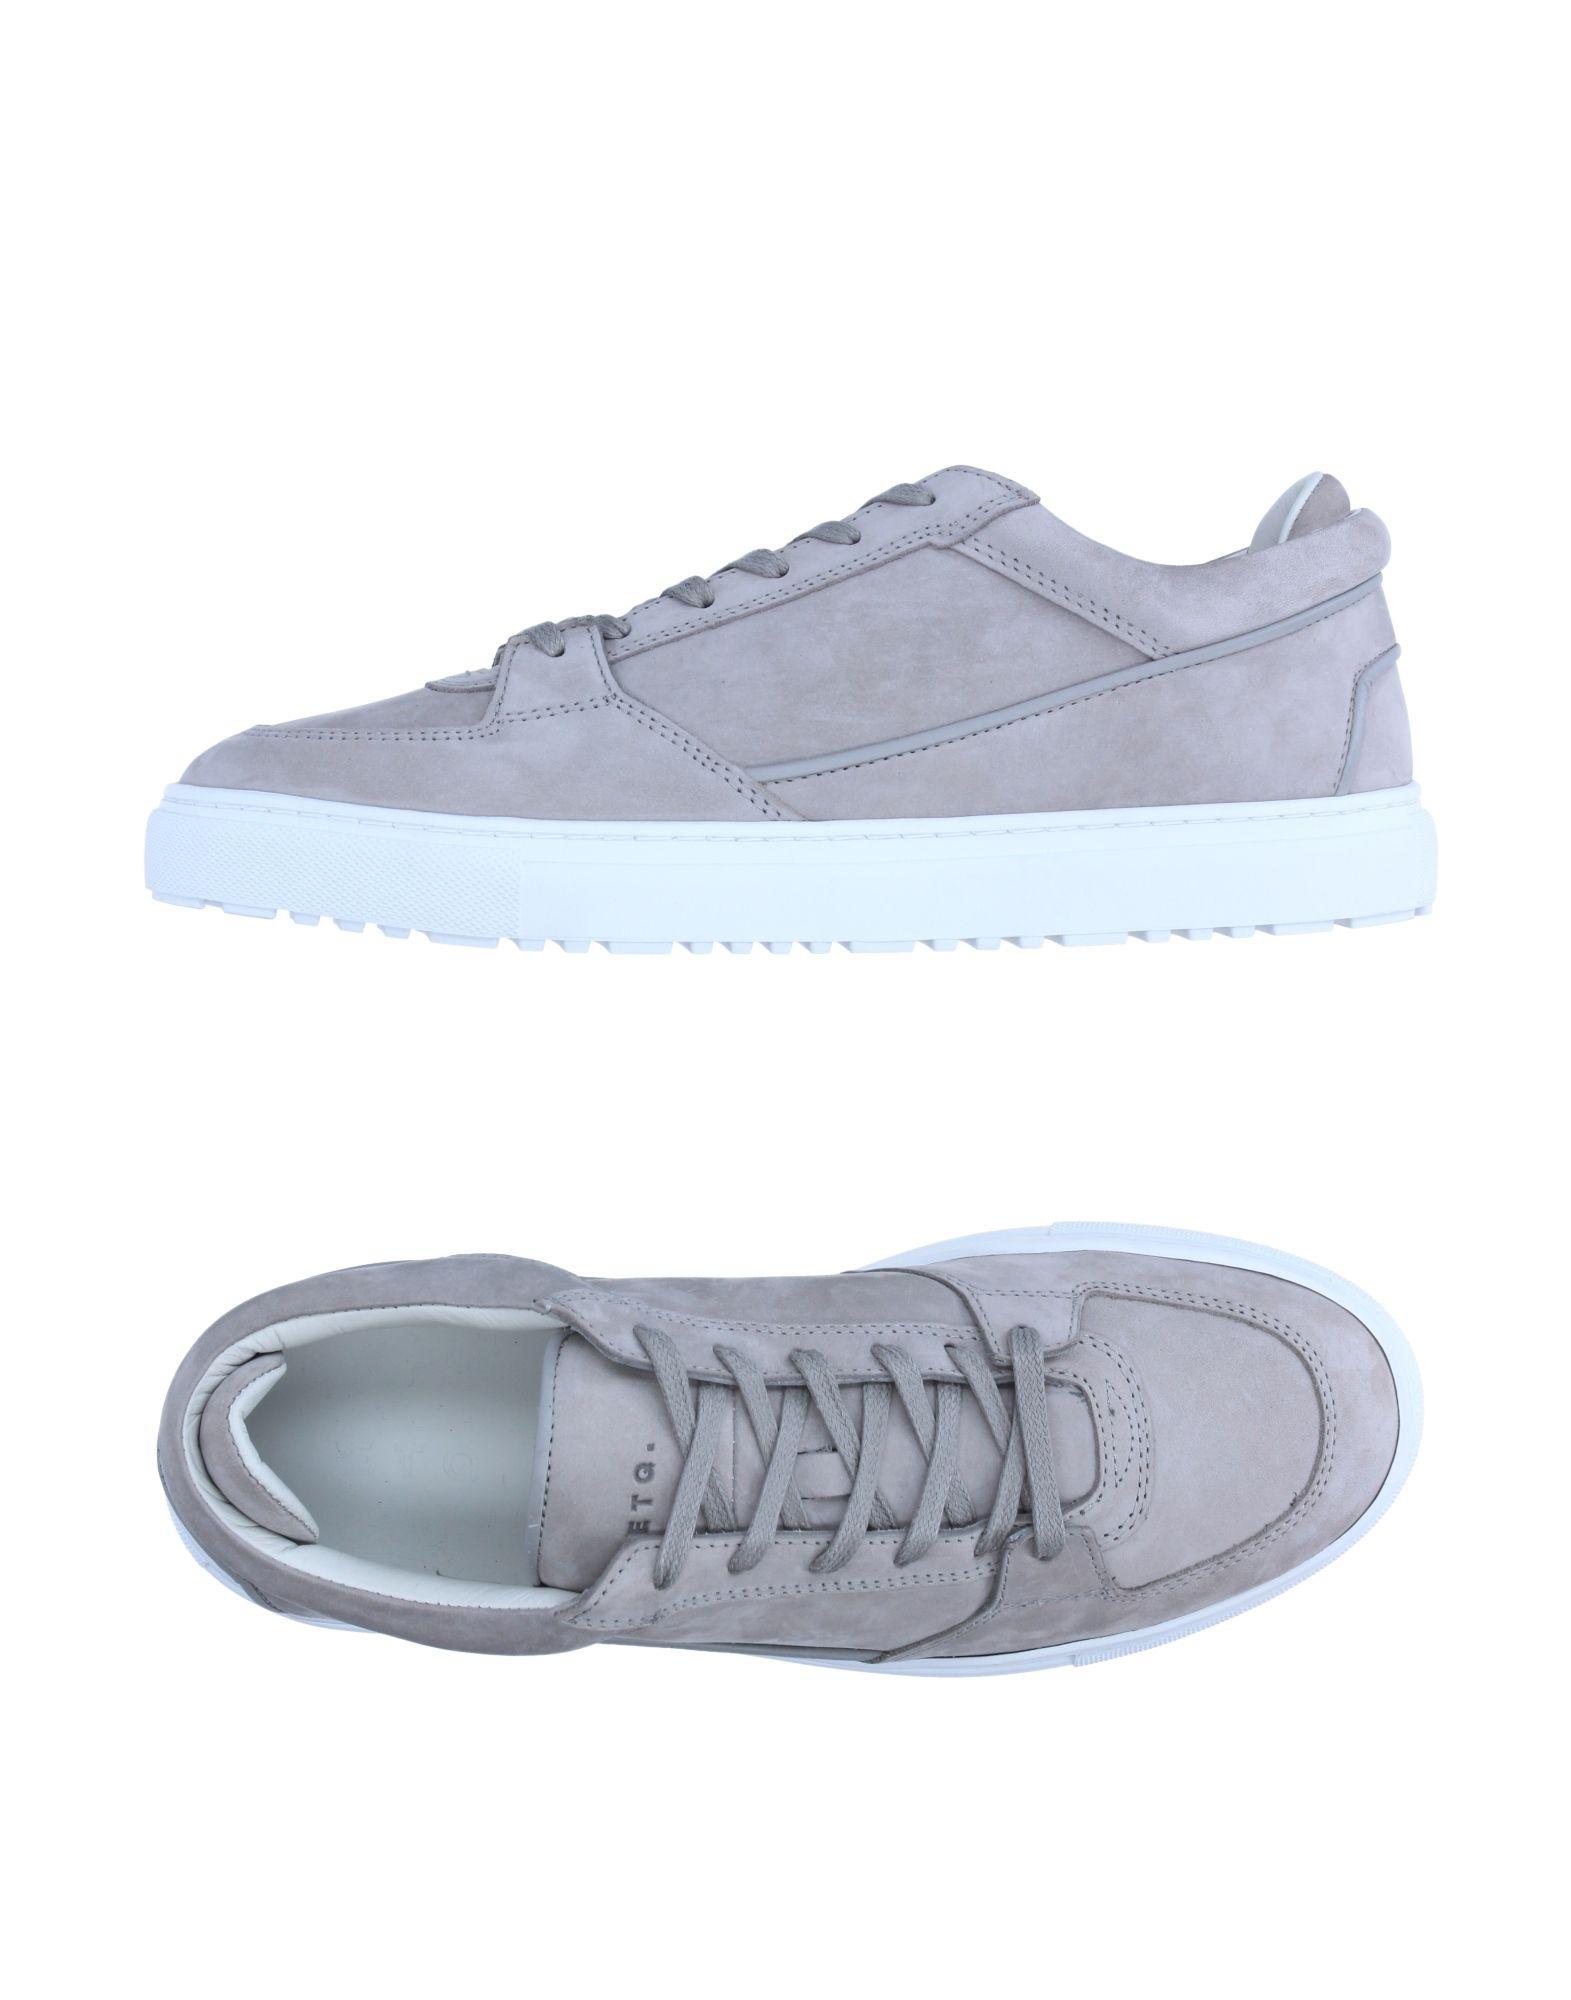 12b94aaa8776 Etq Amsterdam Sneakers - Men Men Men Etq Amsterdam Sneakers online on  Australia - 11249099EM e1ce5e